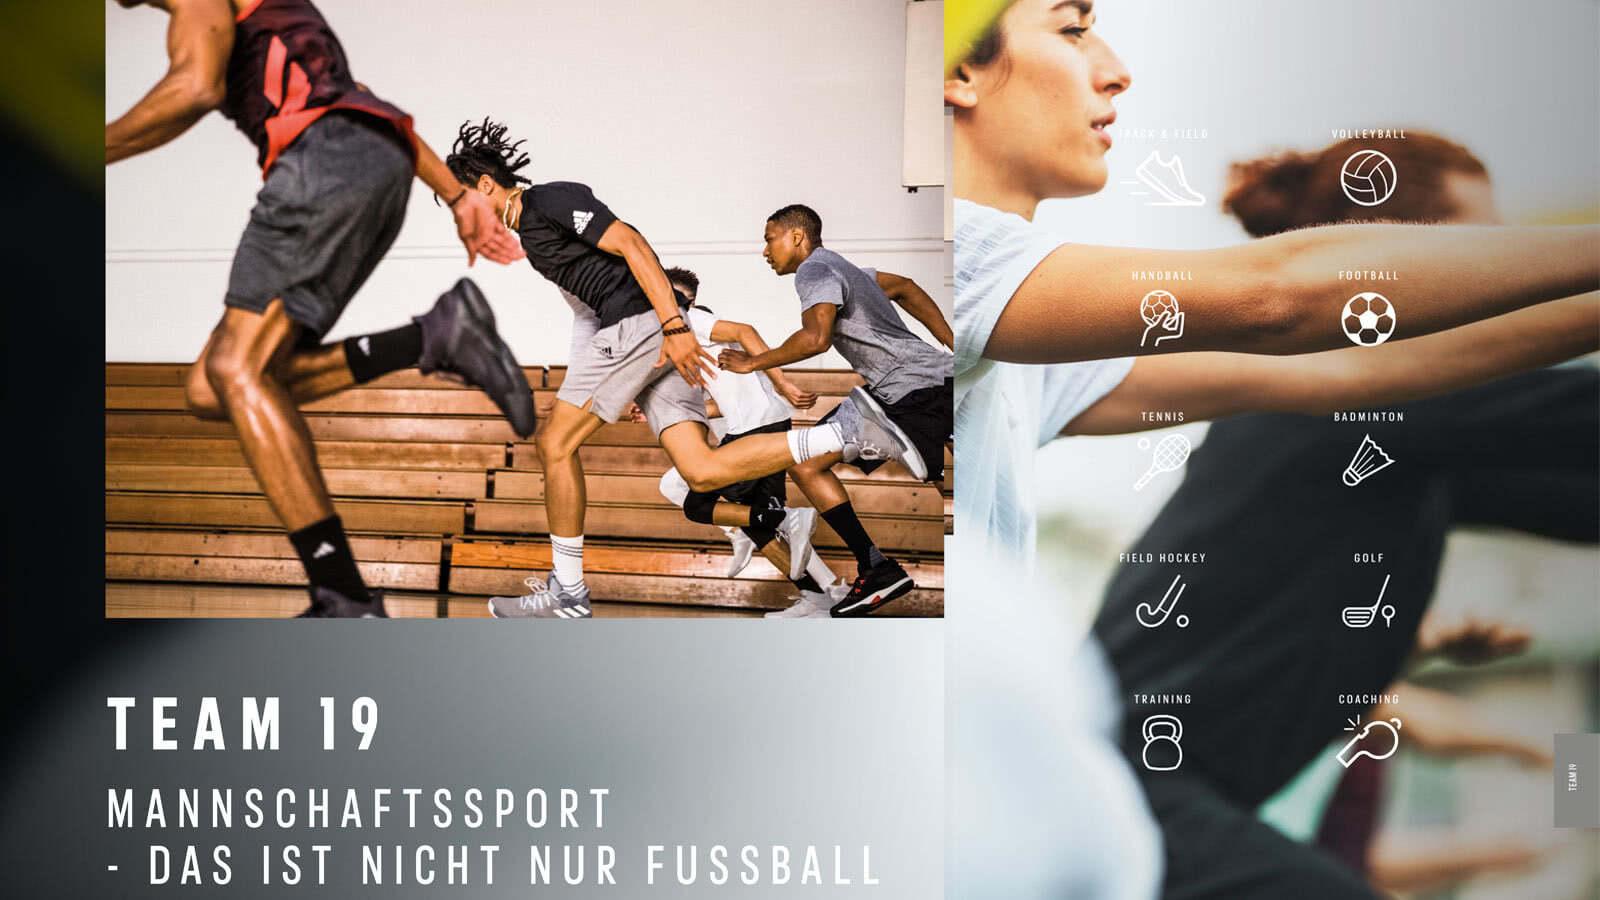 Die adidas Team 19 Sportbekleidung